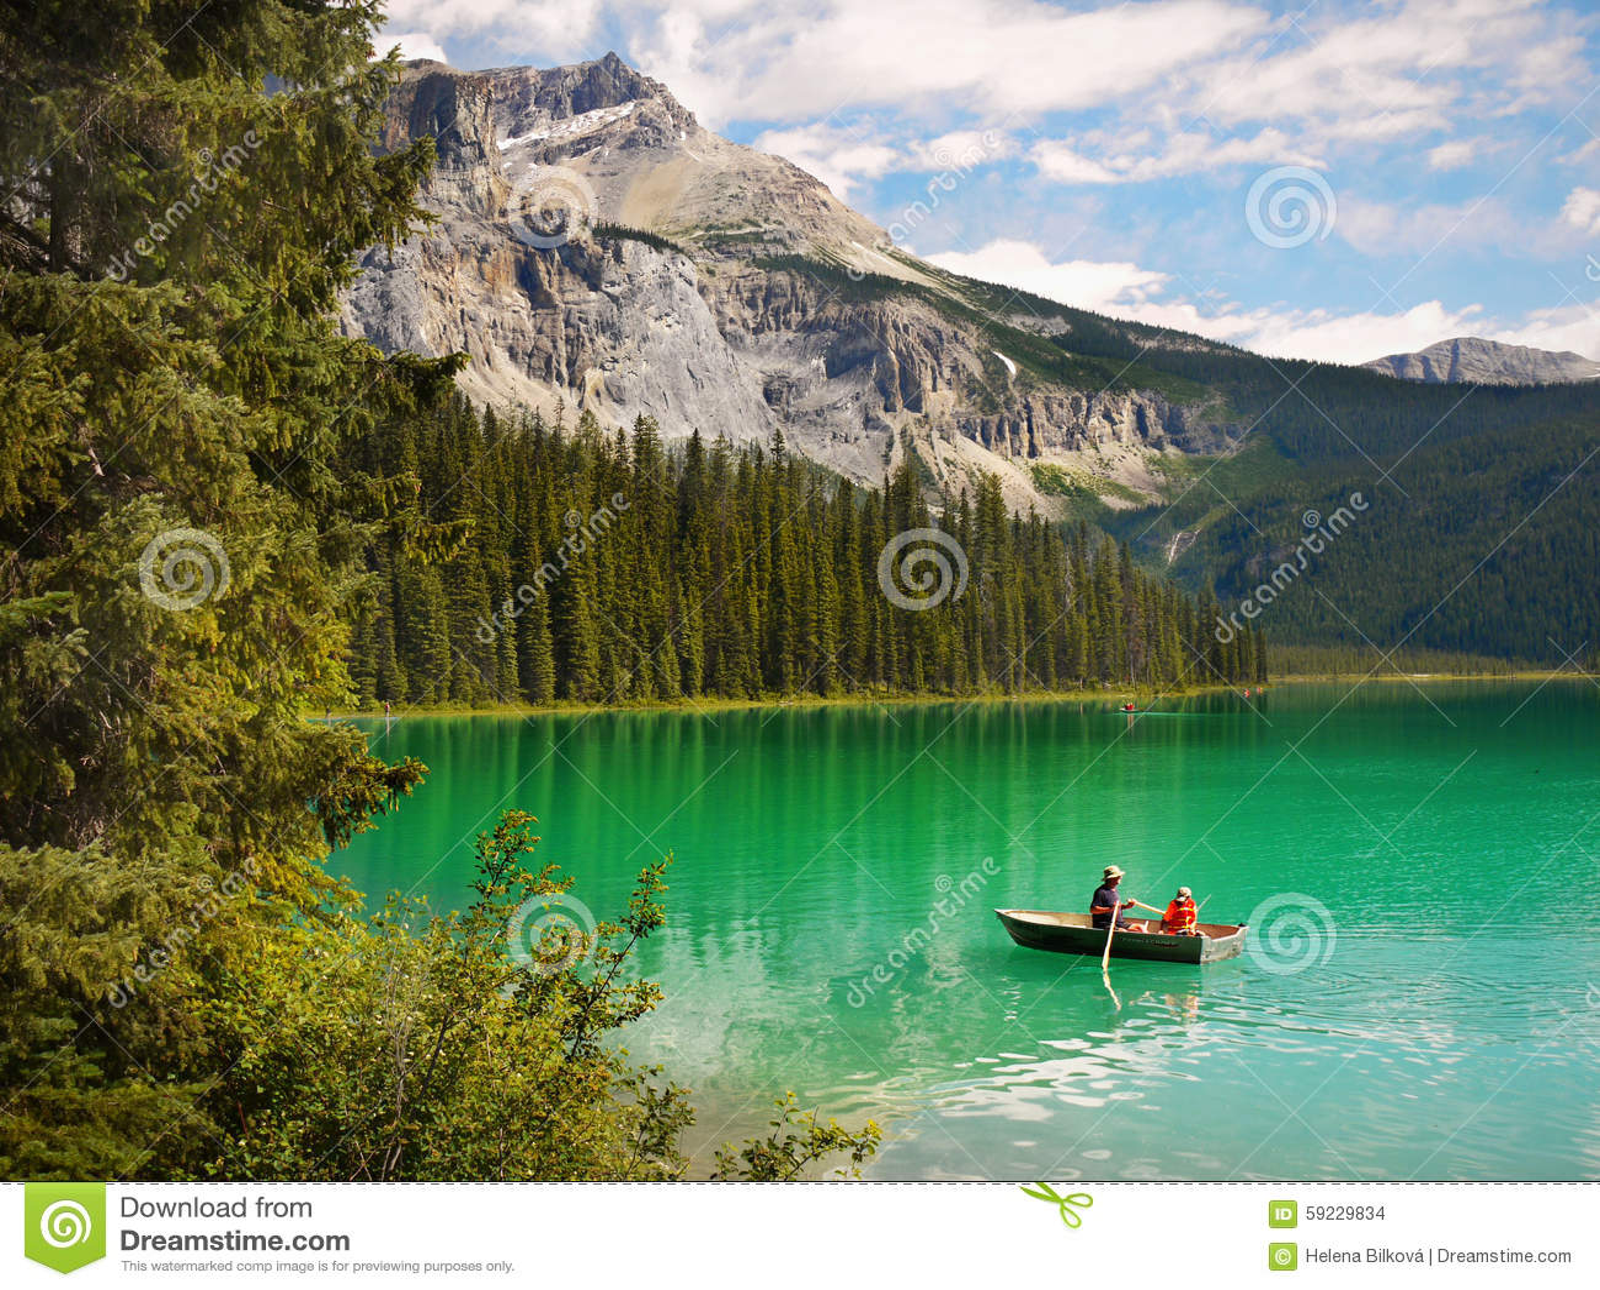 Magic Green Colours of Landscape